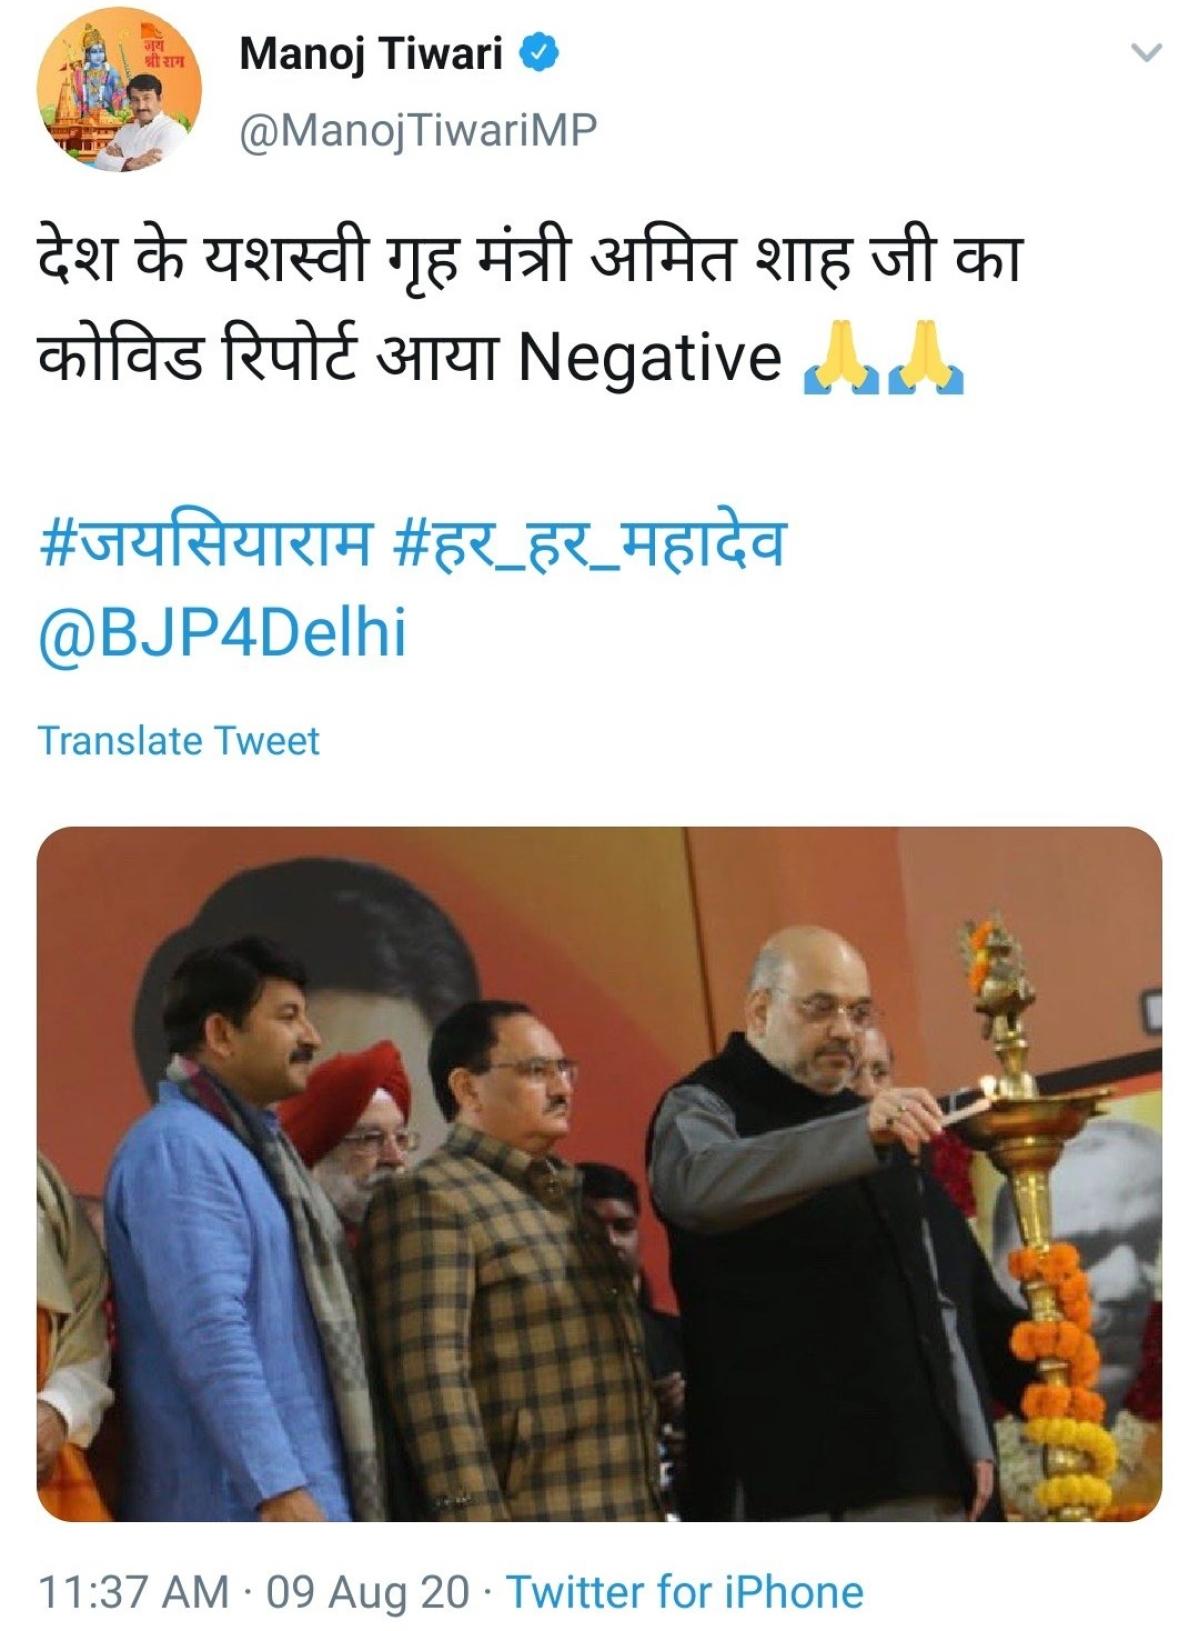 Has Amit Shah tested coronavirus negative? Manoj Tiwari deletes tweet, MHA says wait